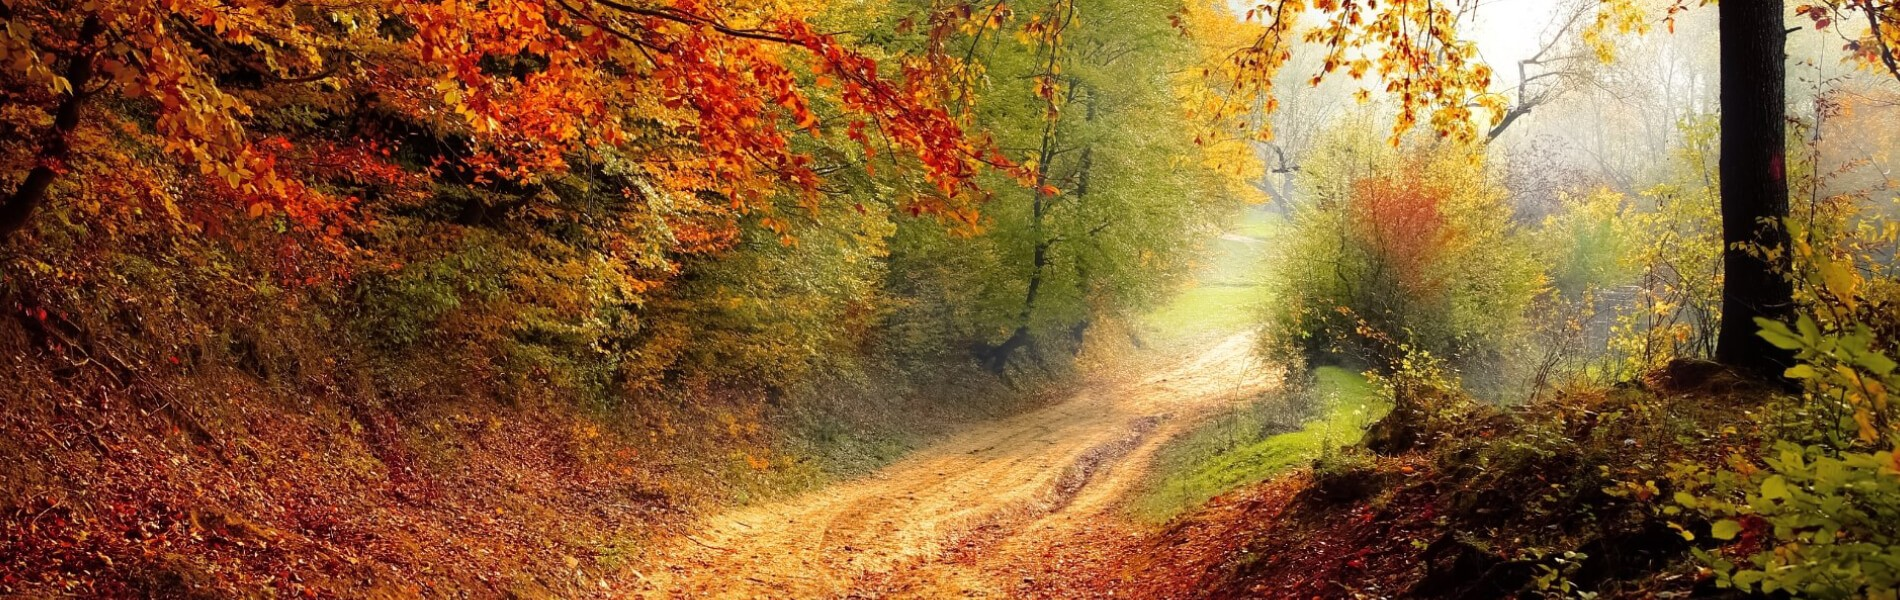 Path through woods in Autumn